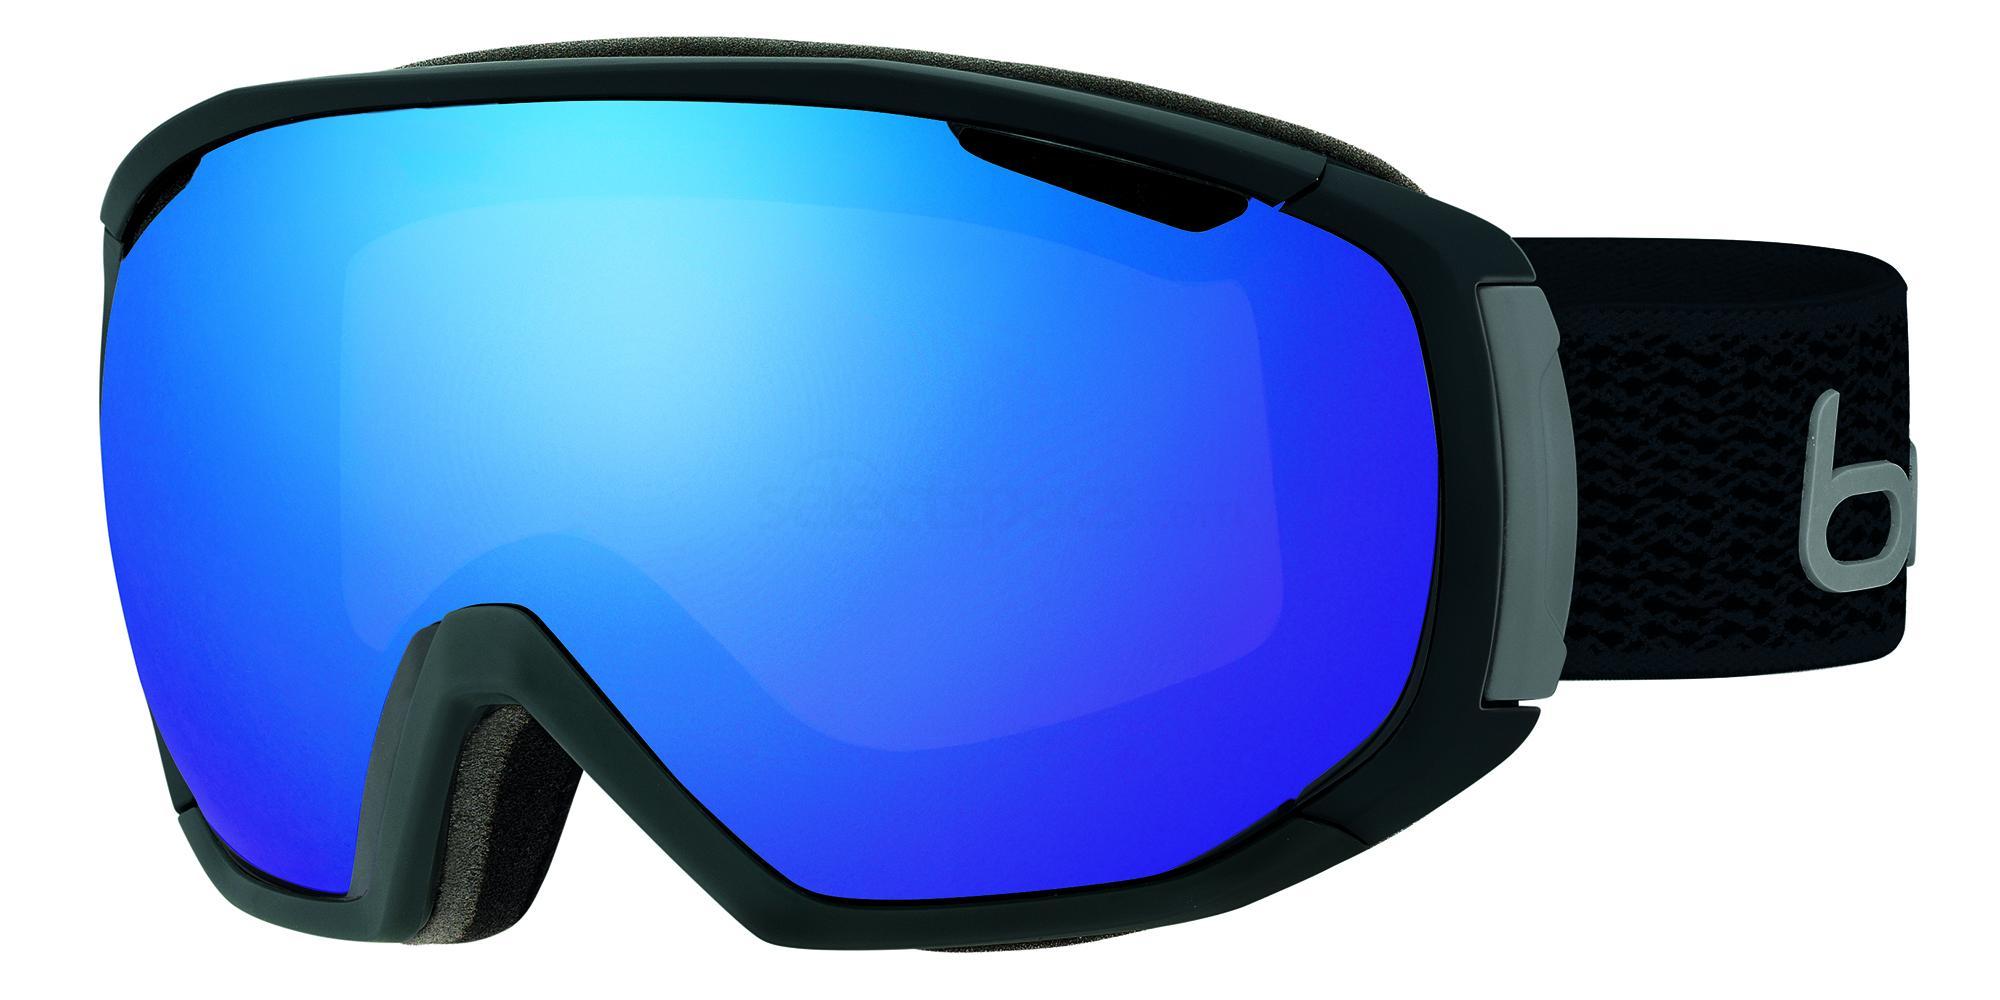 21643 TSAR Goggles, Bolle